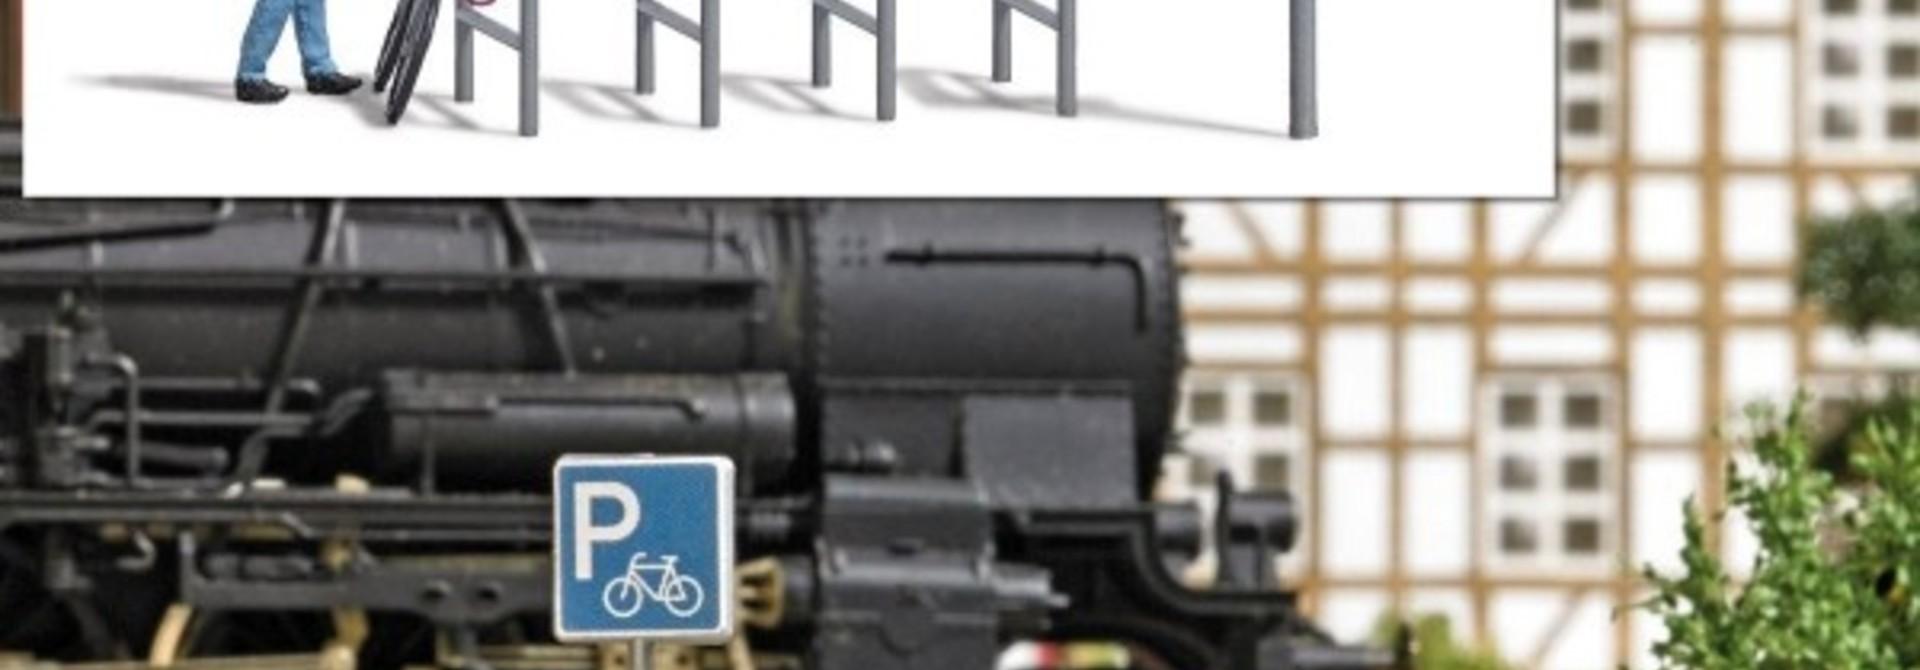 7950 fietsendief H0